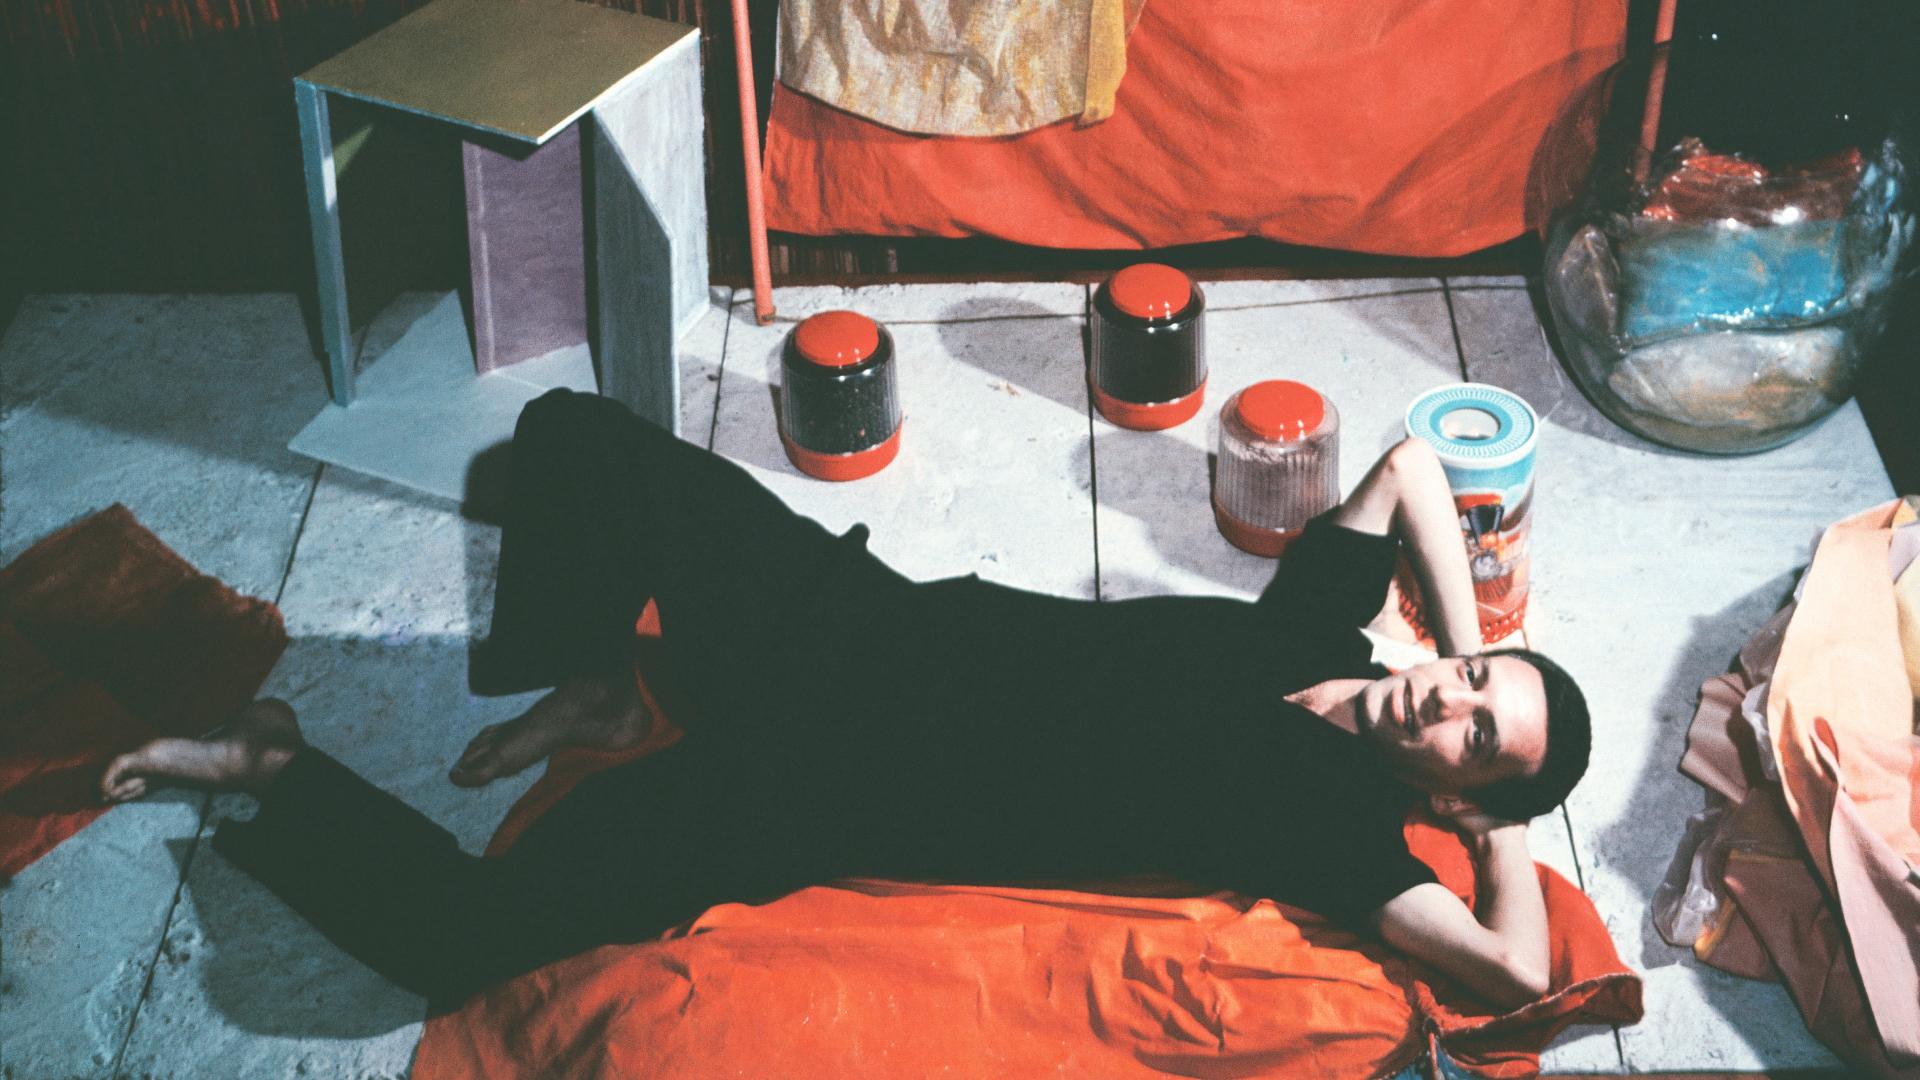 Hélio Oiticica with Bolides and Paragolés in his studio at Engenheiro Alfredo Duarte Street, Rio de Janeiro, 1965 | Lisson Gallery | Hélio Oiticica | STIRworld